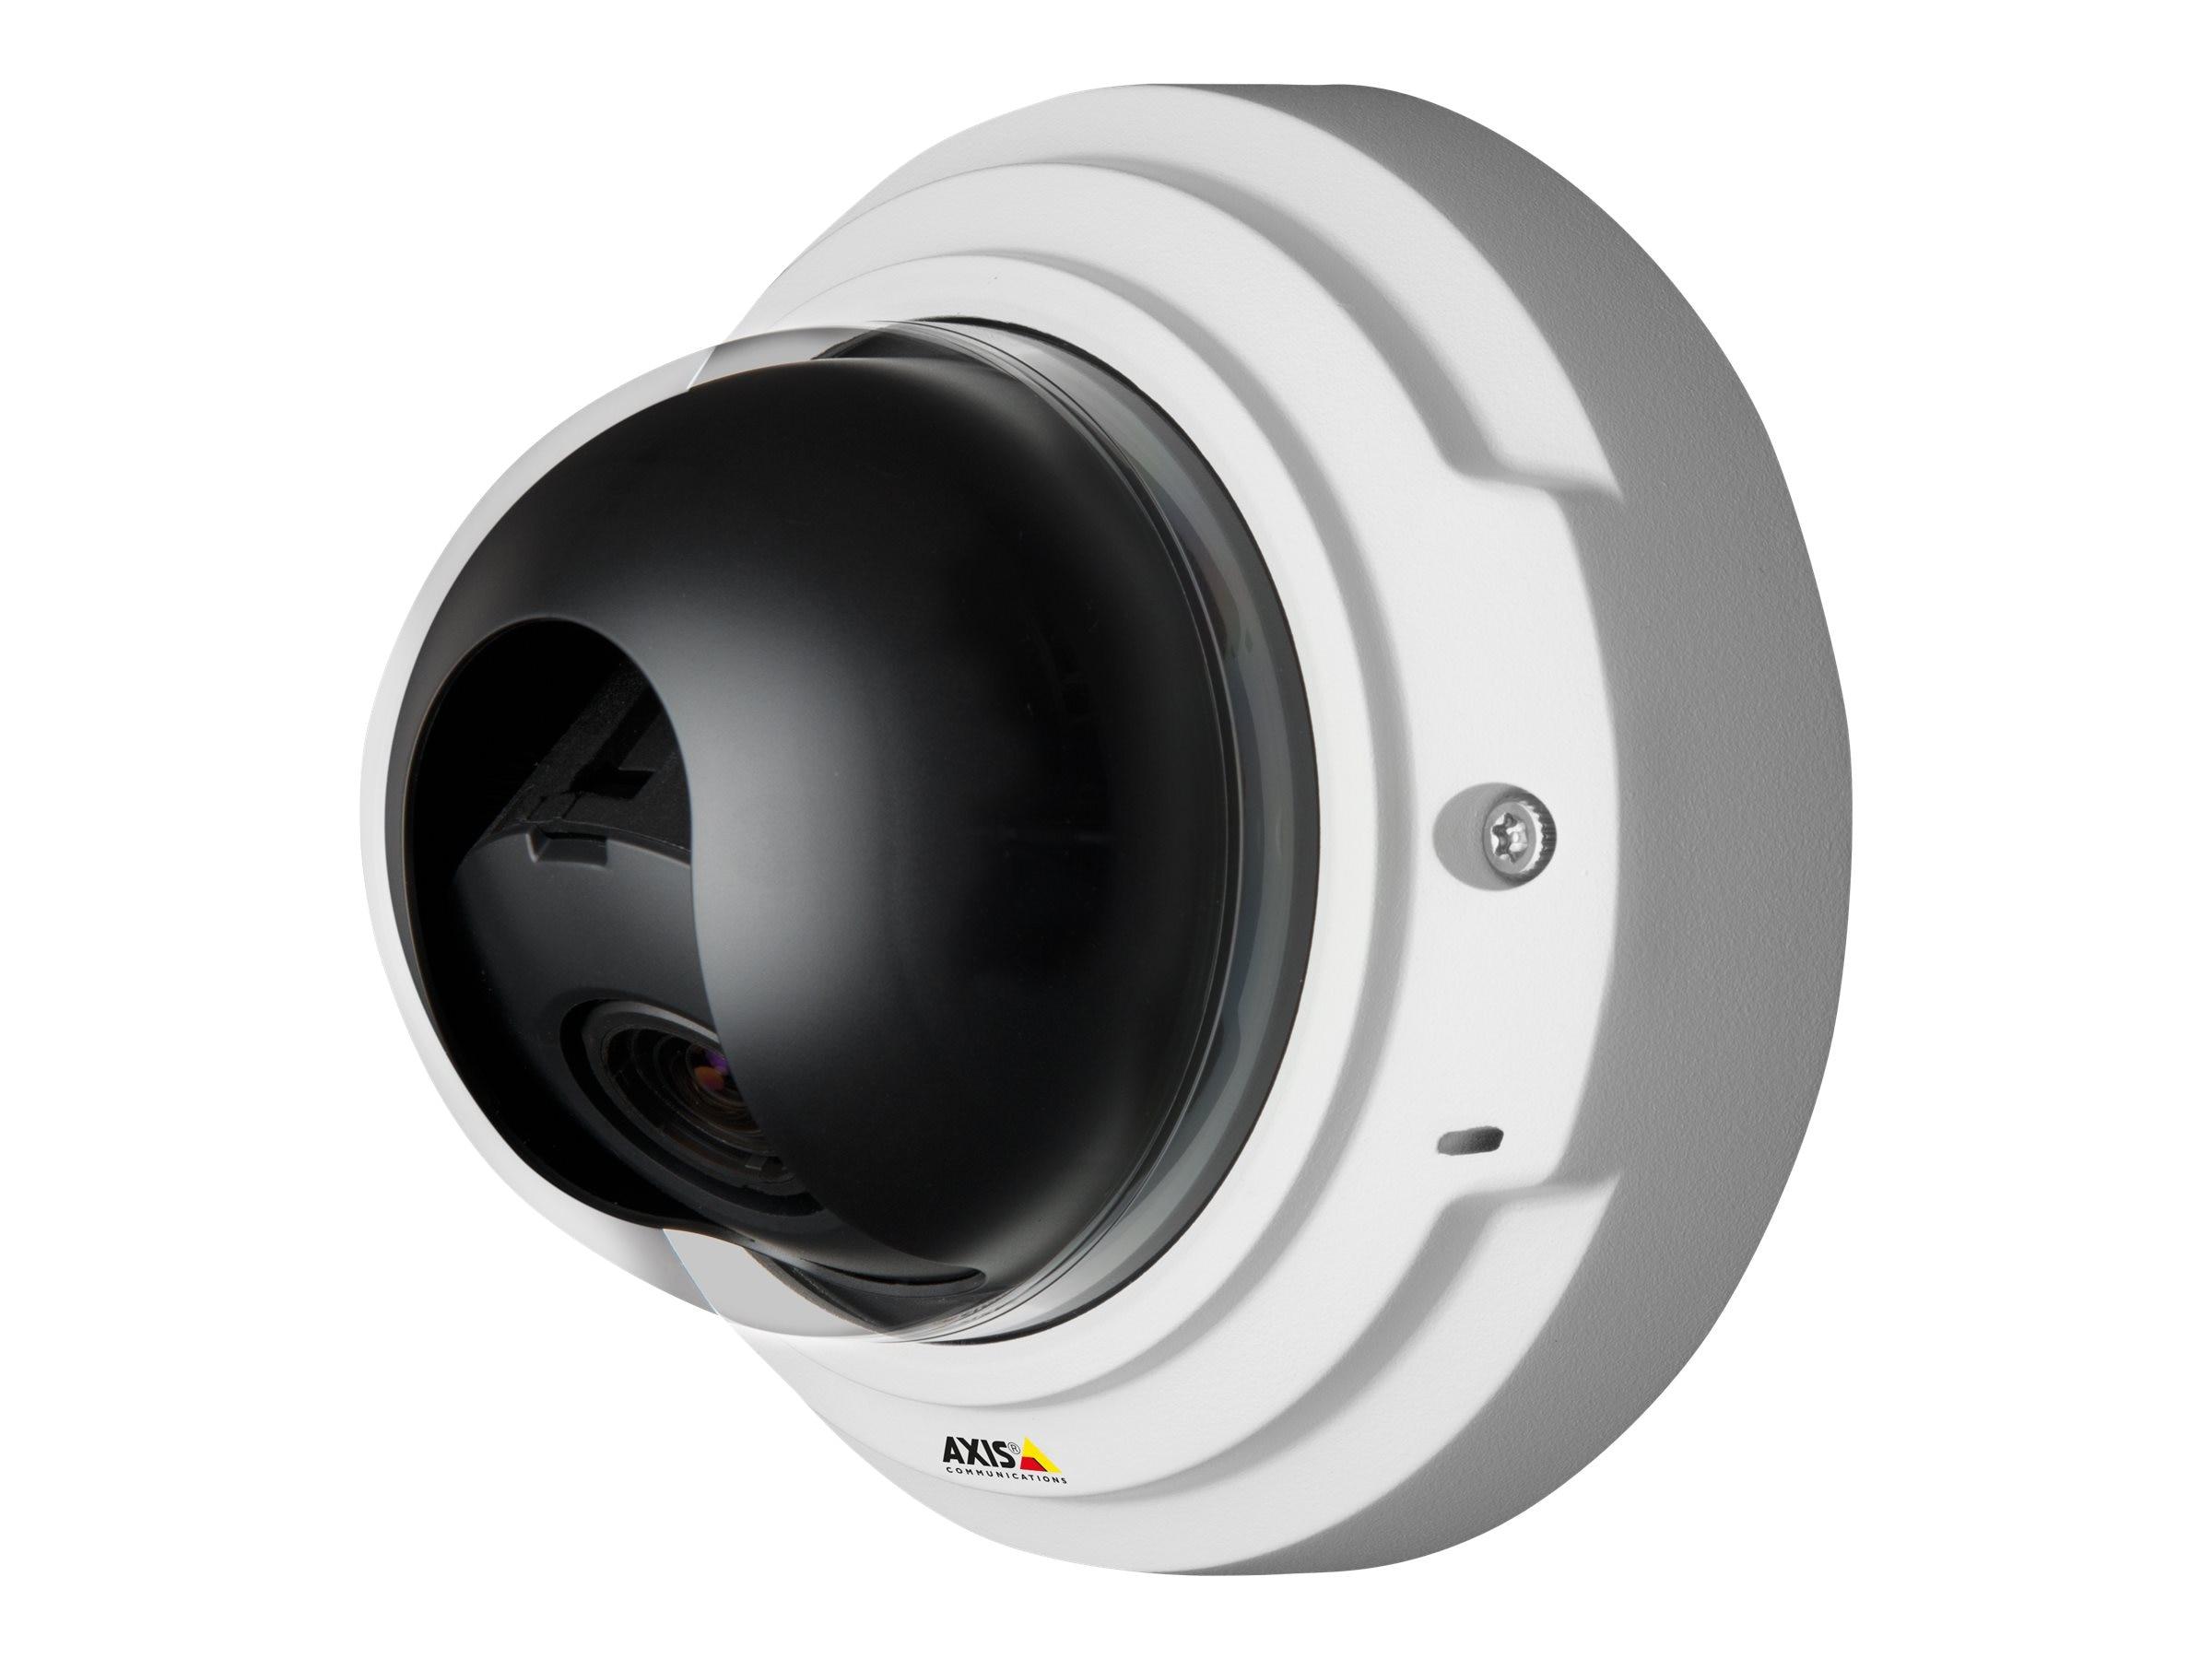 Axis P3384-V Fixed Dome Network Camera